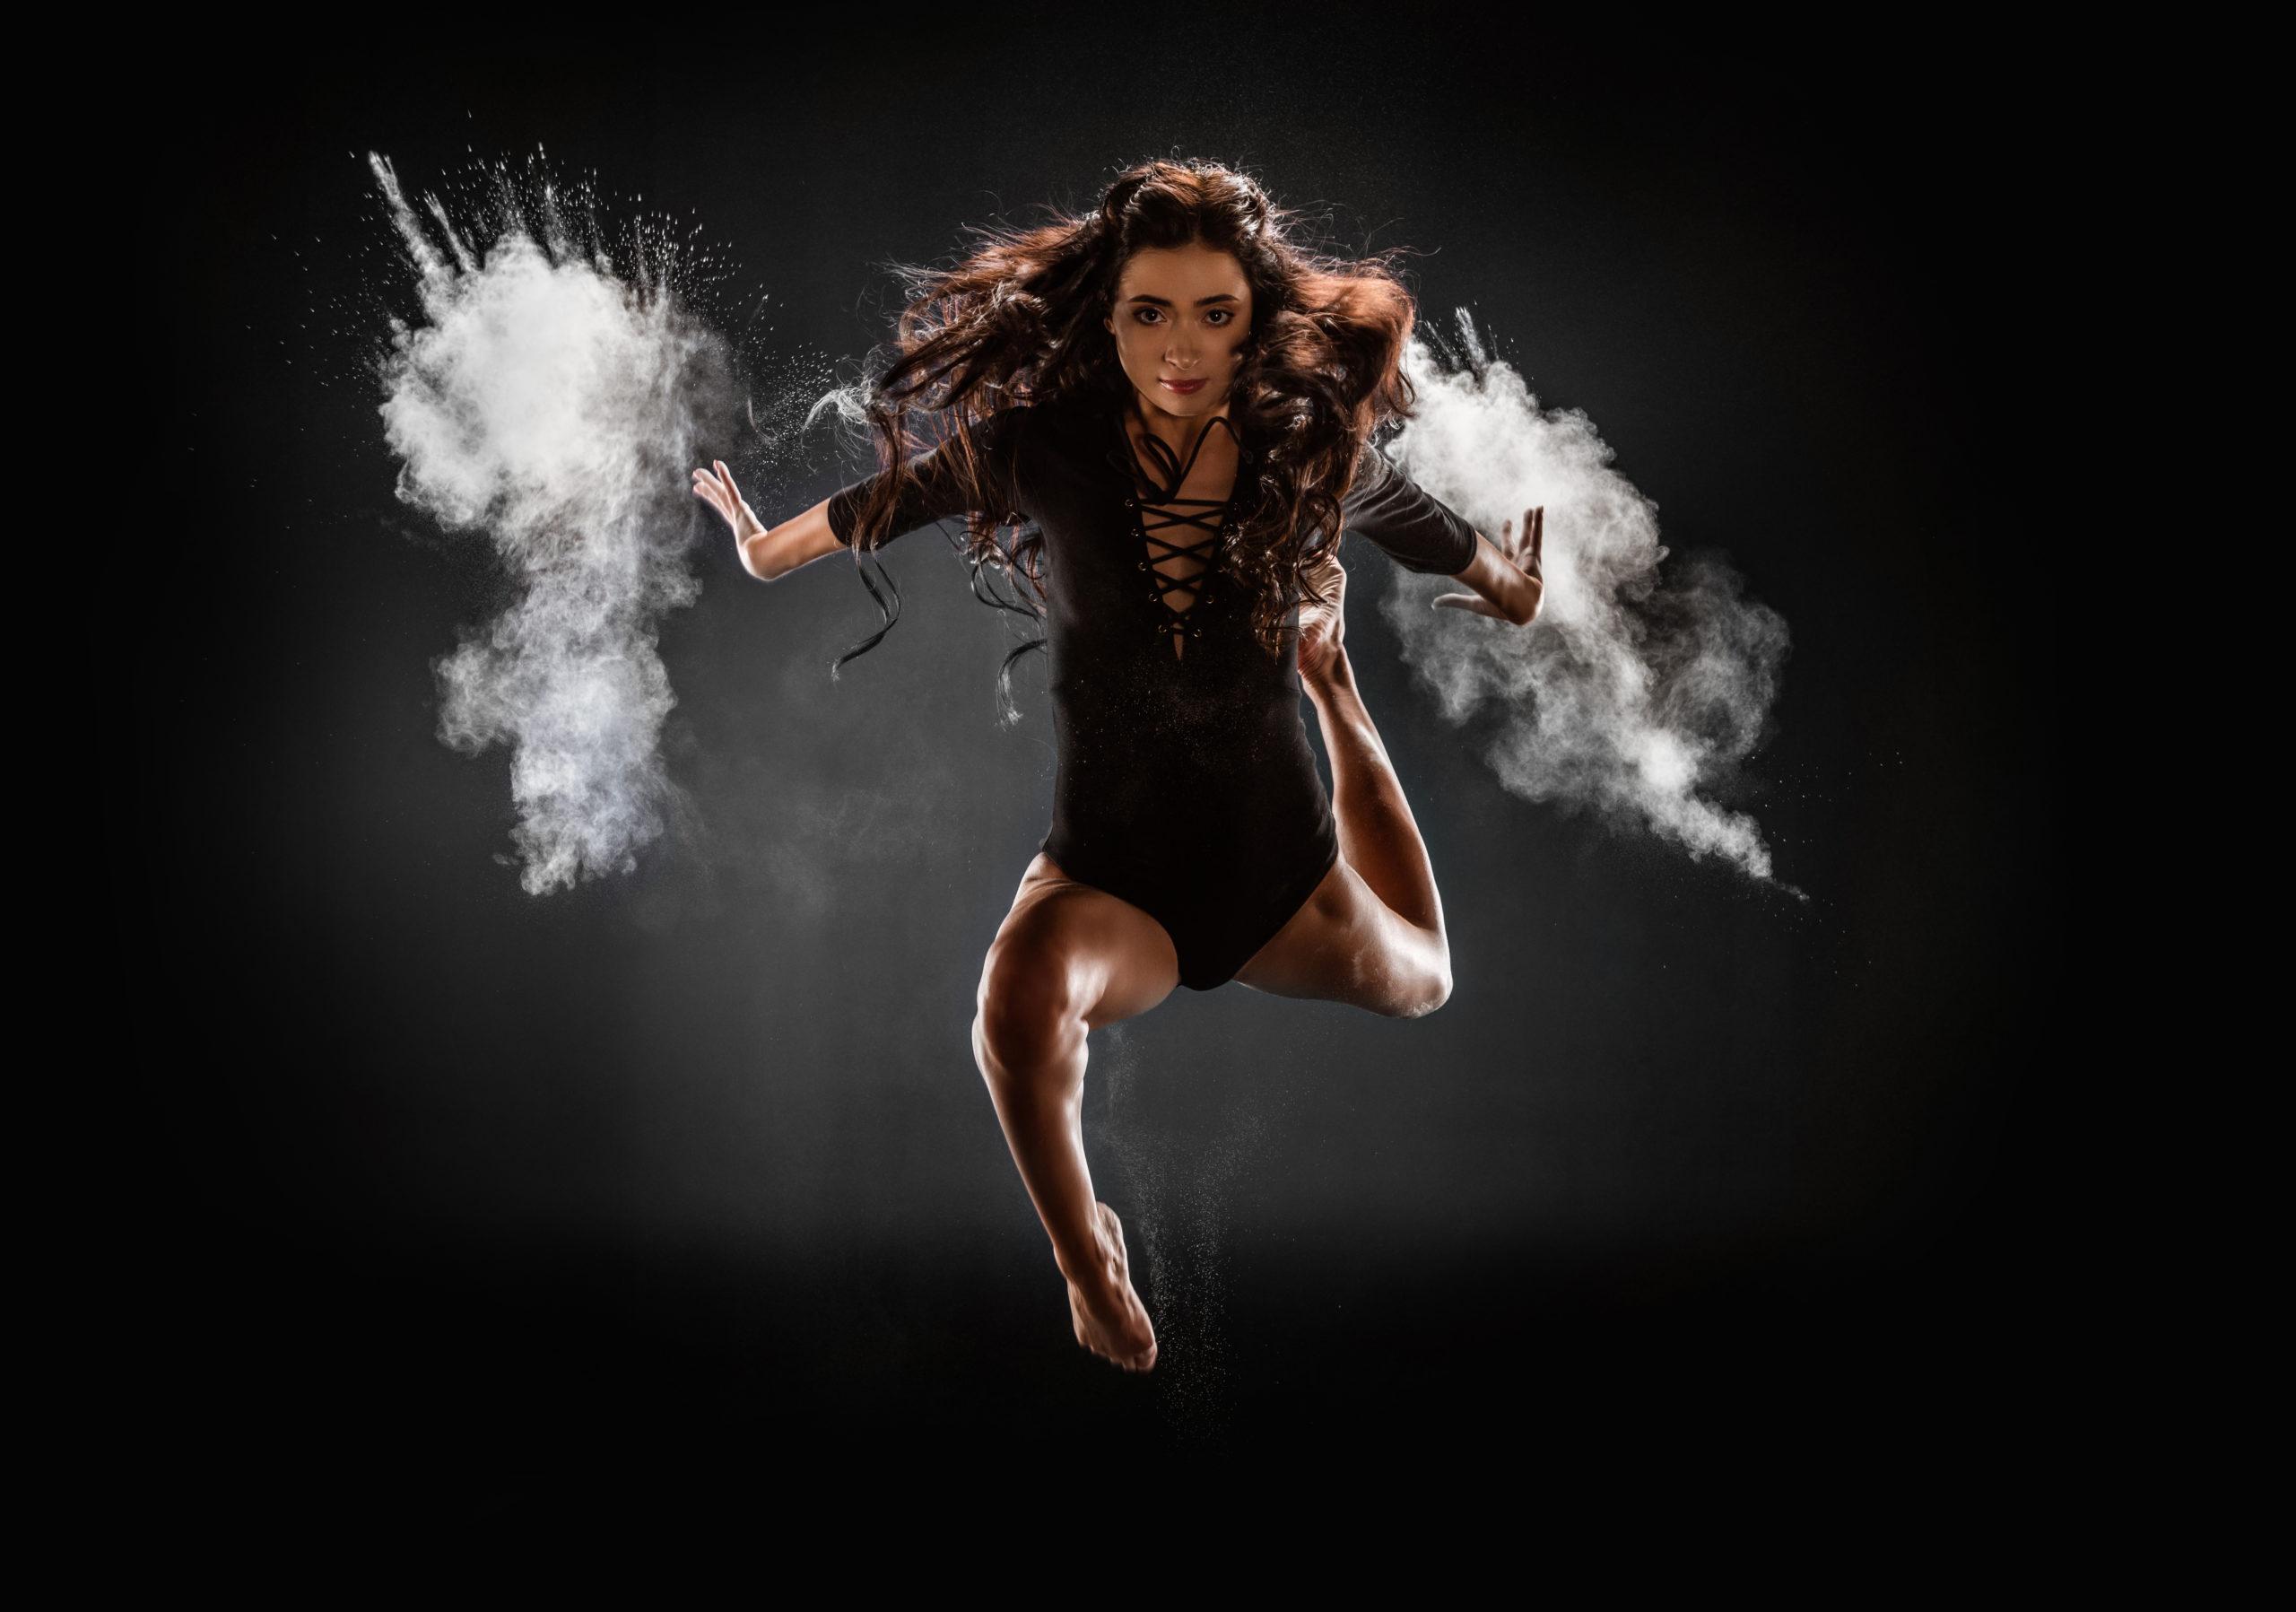 Beautiful ballerina in black bodysuit with talc jumping on dark background